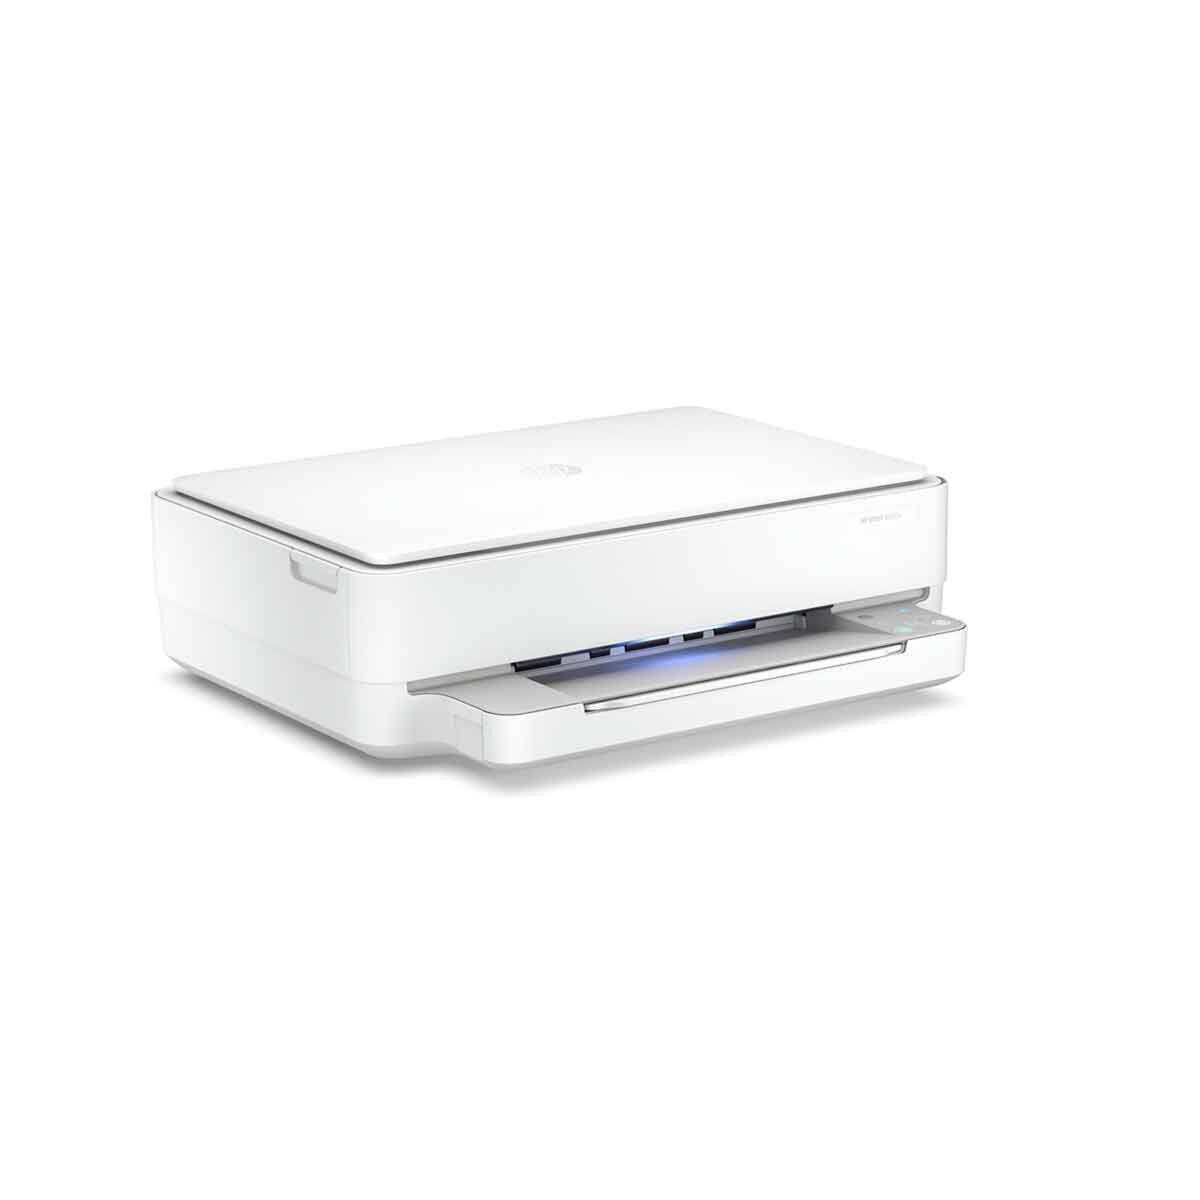 HP Envy 6020e All in One Printer